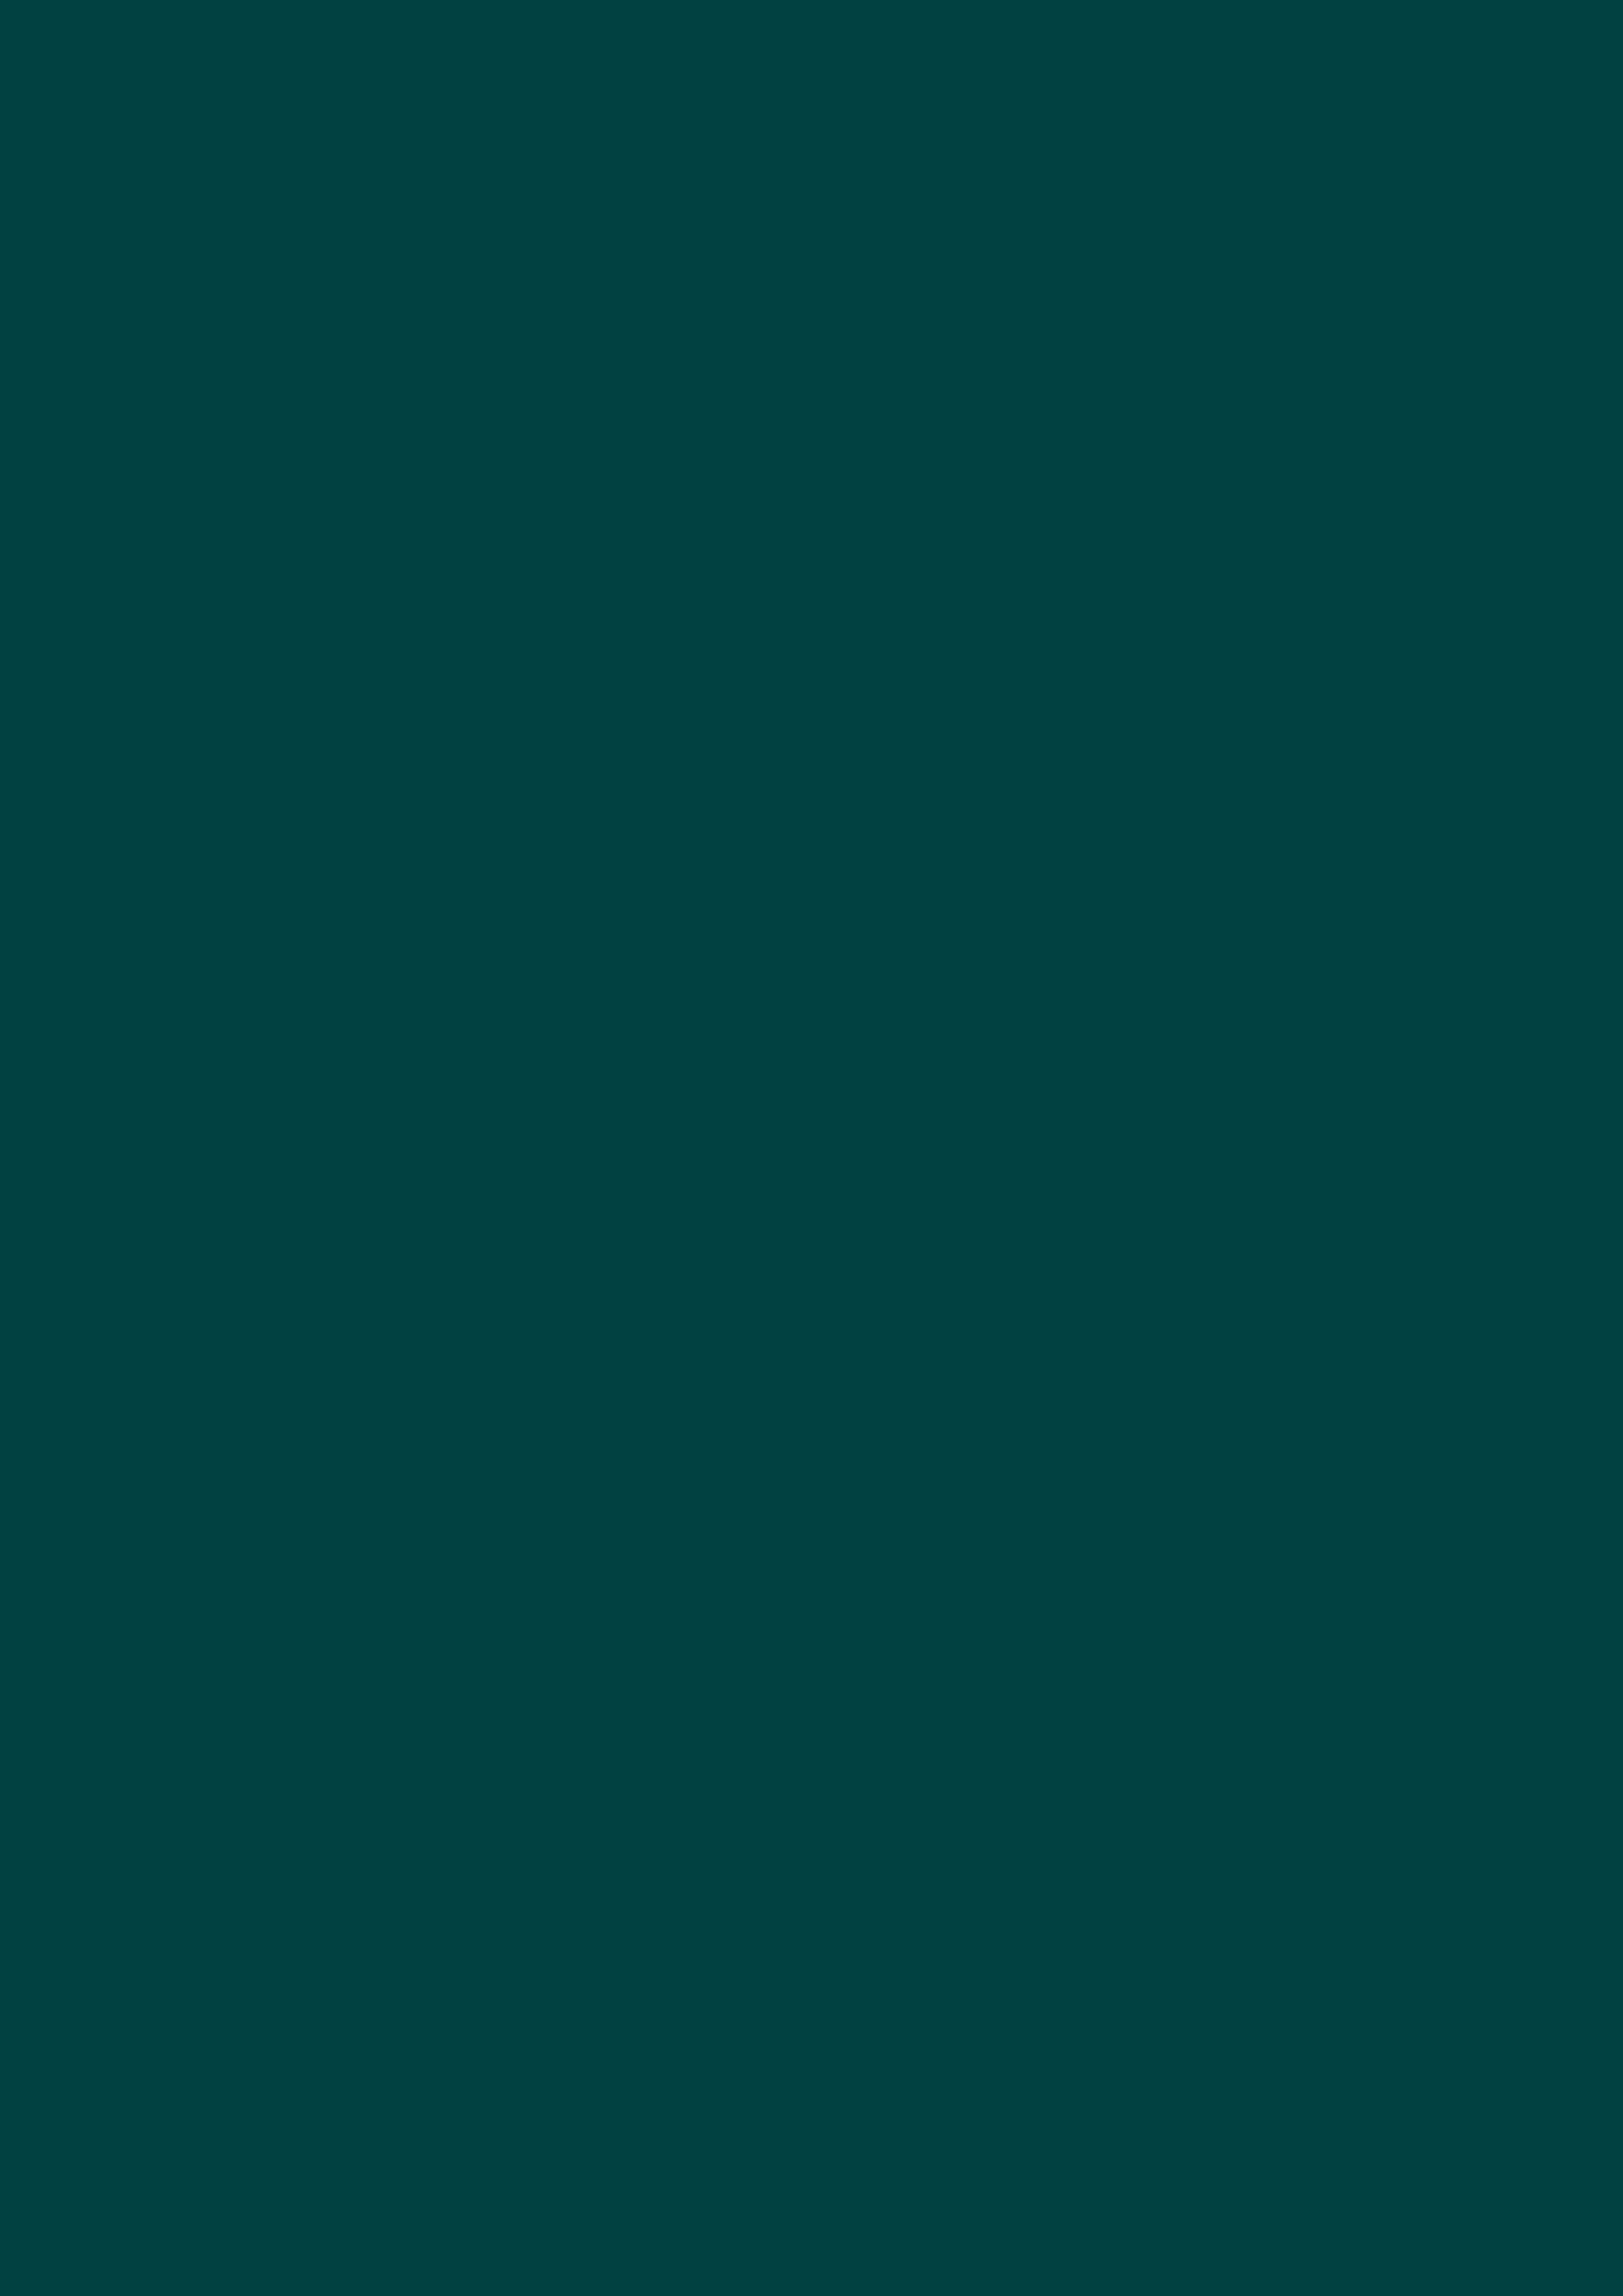 2480x3508 Warm Black Solid Color Background